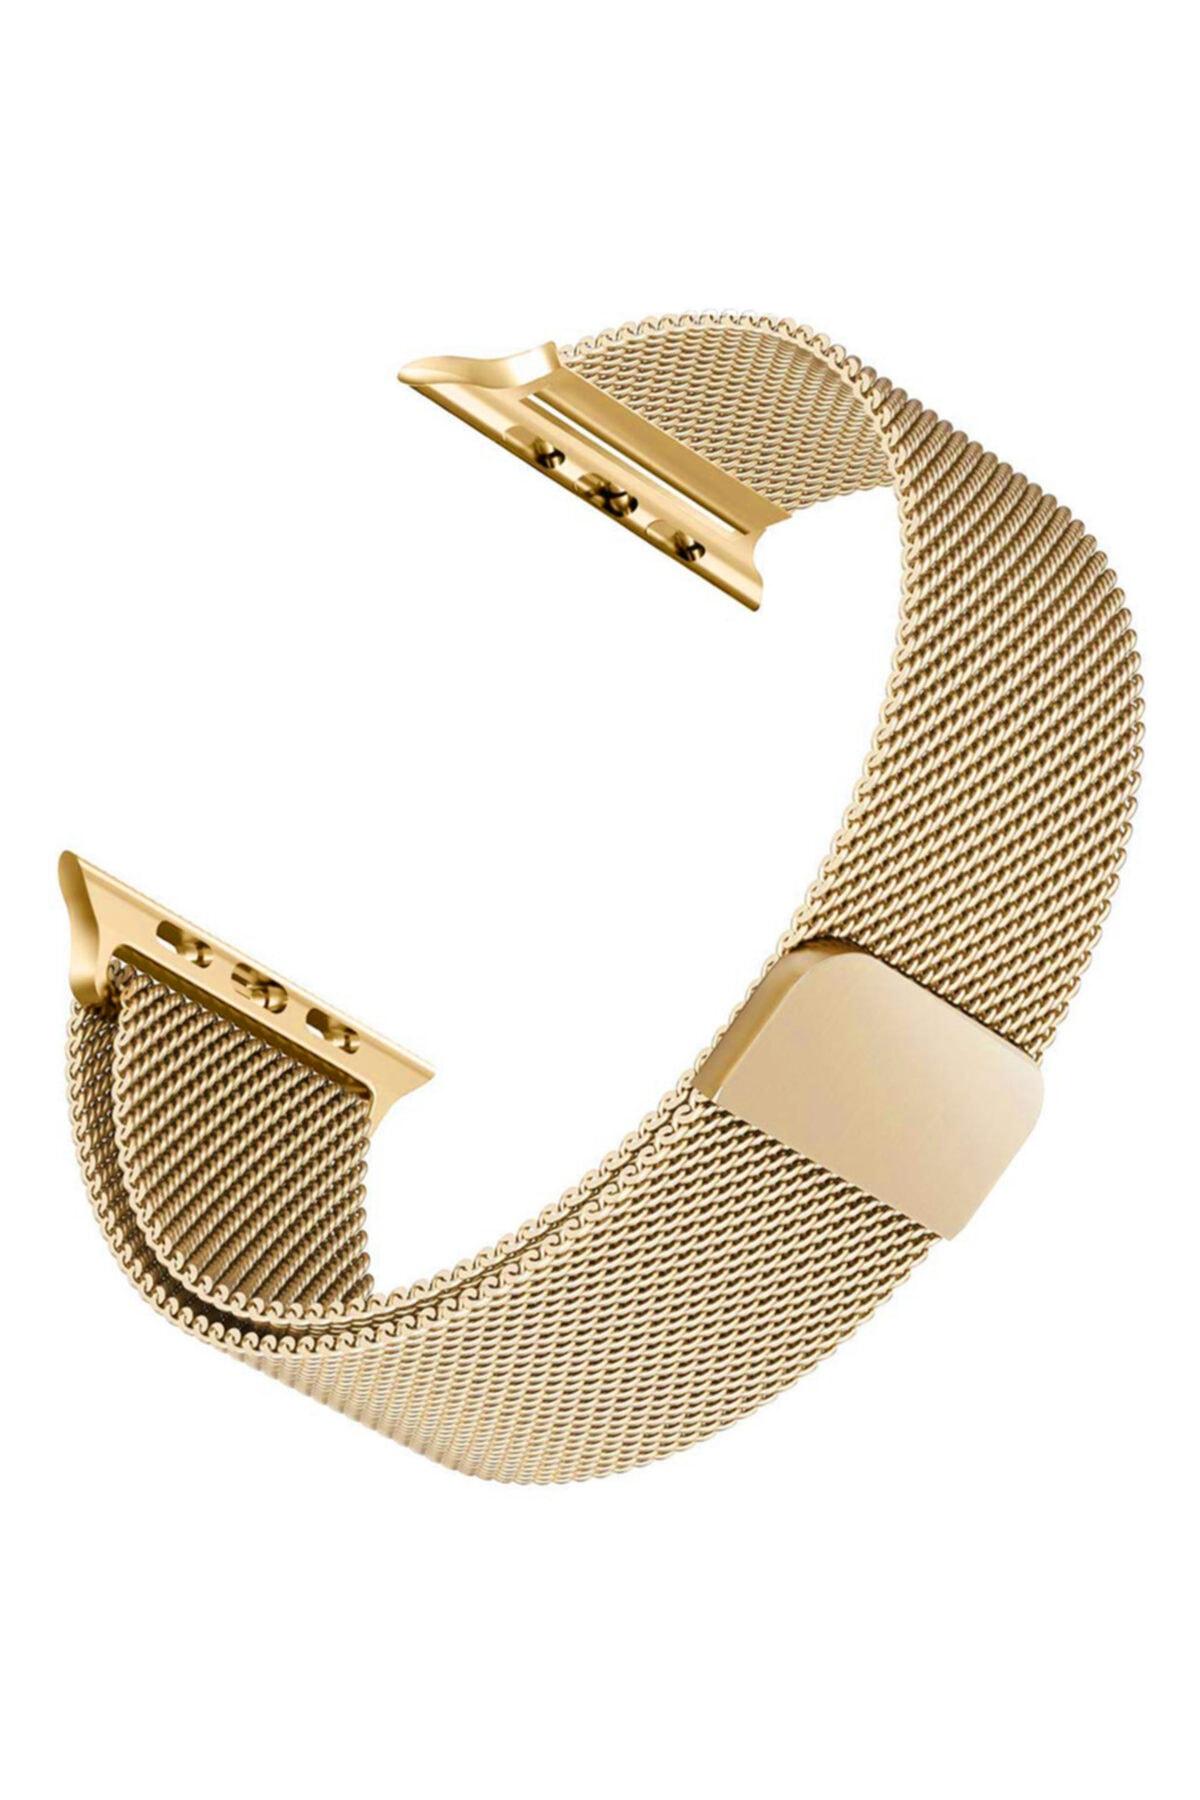 Microsonic Microsonic Watch 1 38mm Milanese Loop Kordon Gold 1